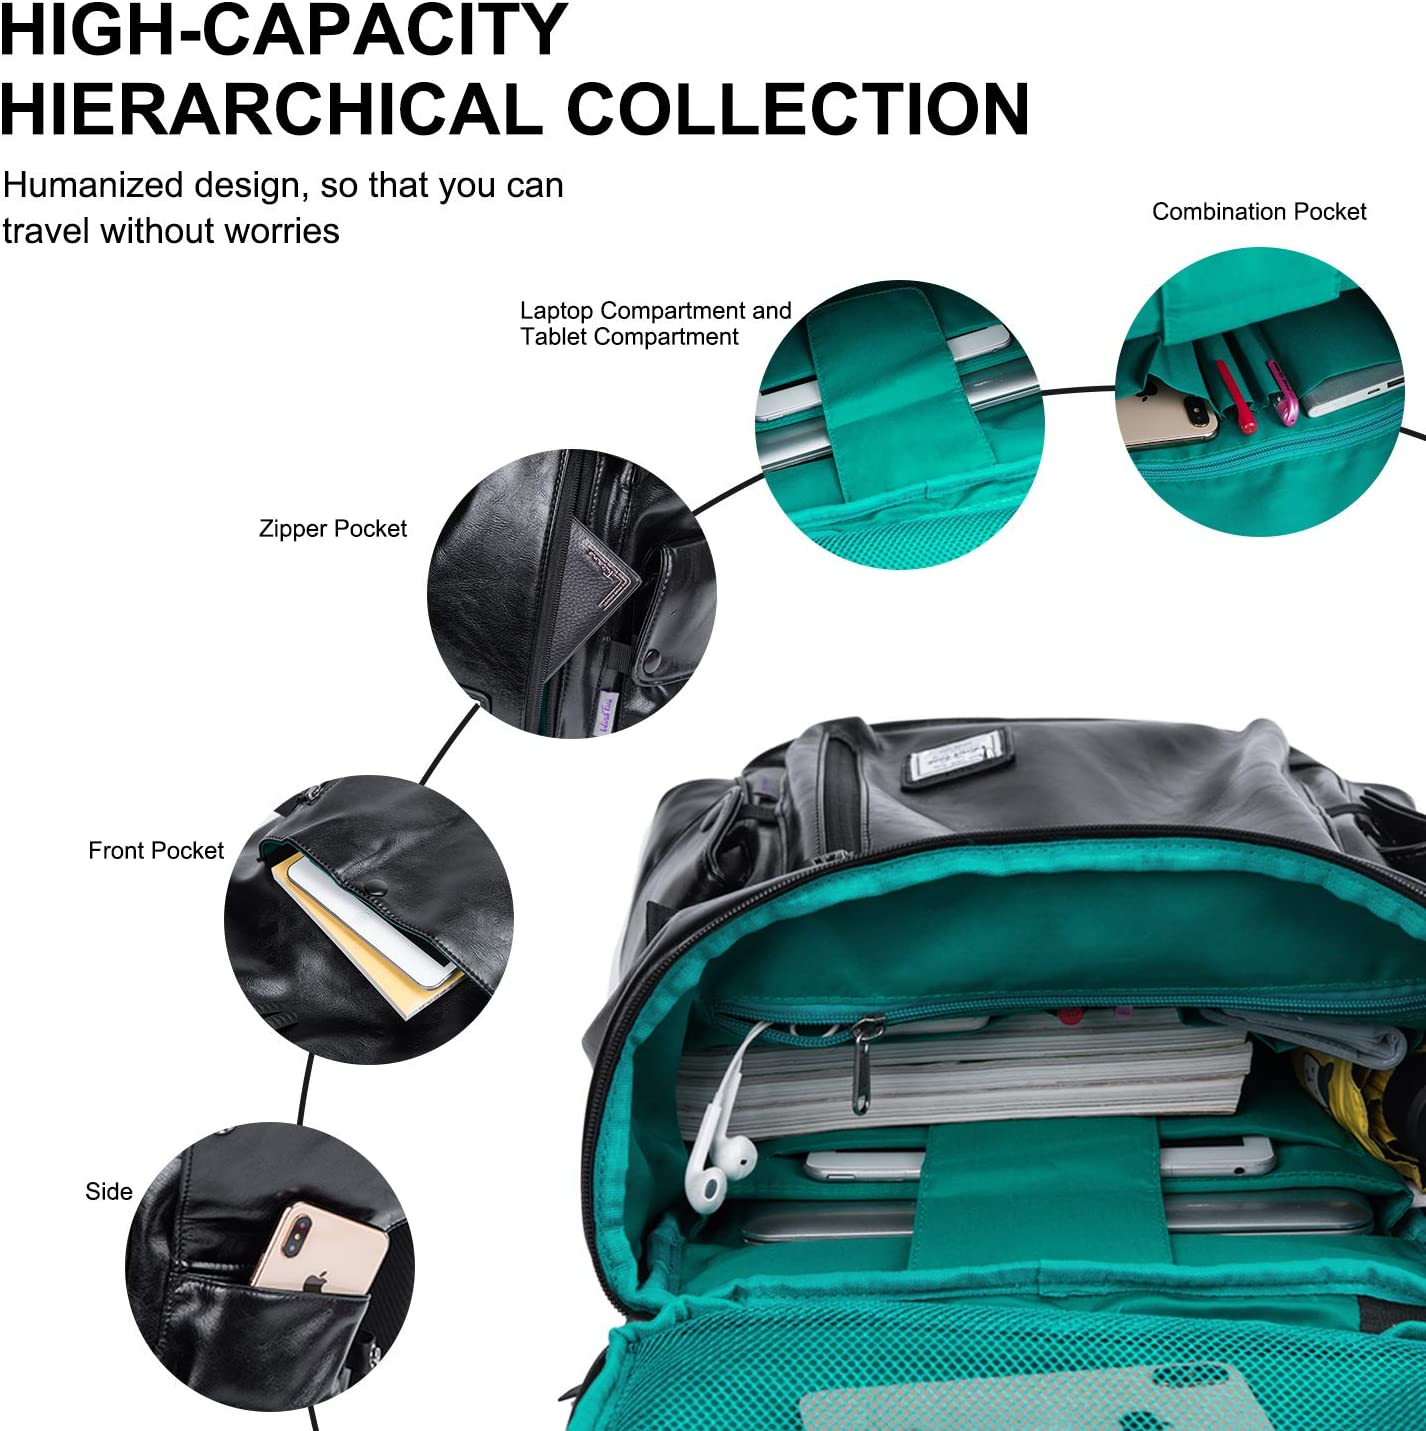 Wind Took Mochila Lona Portatil 15.6 Pulgadas Mochila Casual Mochila Ordenador Portatil Mujer con Puerto de USB Mochila Unisex Dackpack para Viaje Trabajo